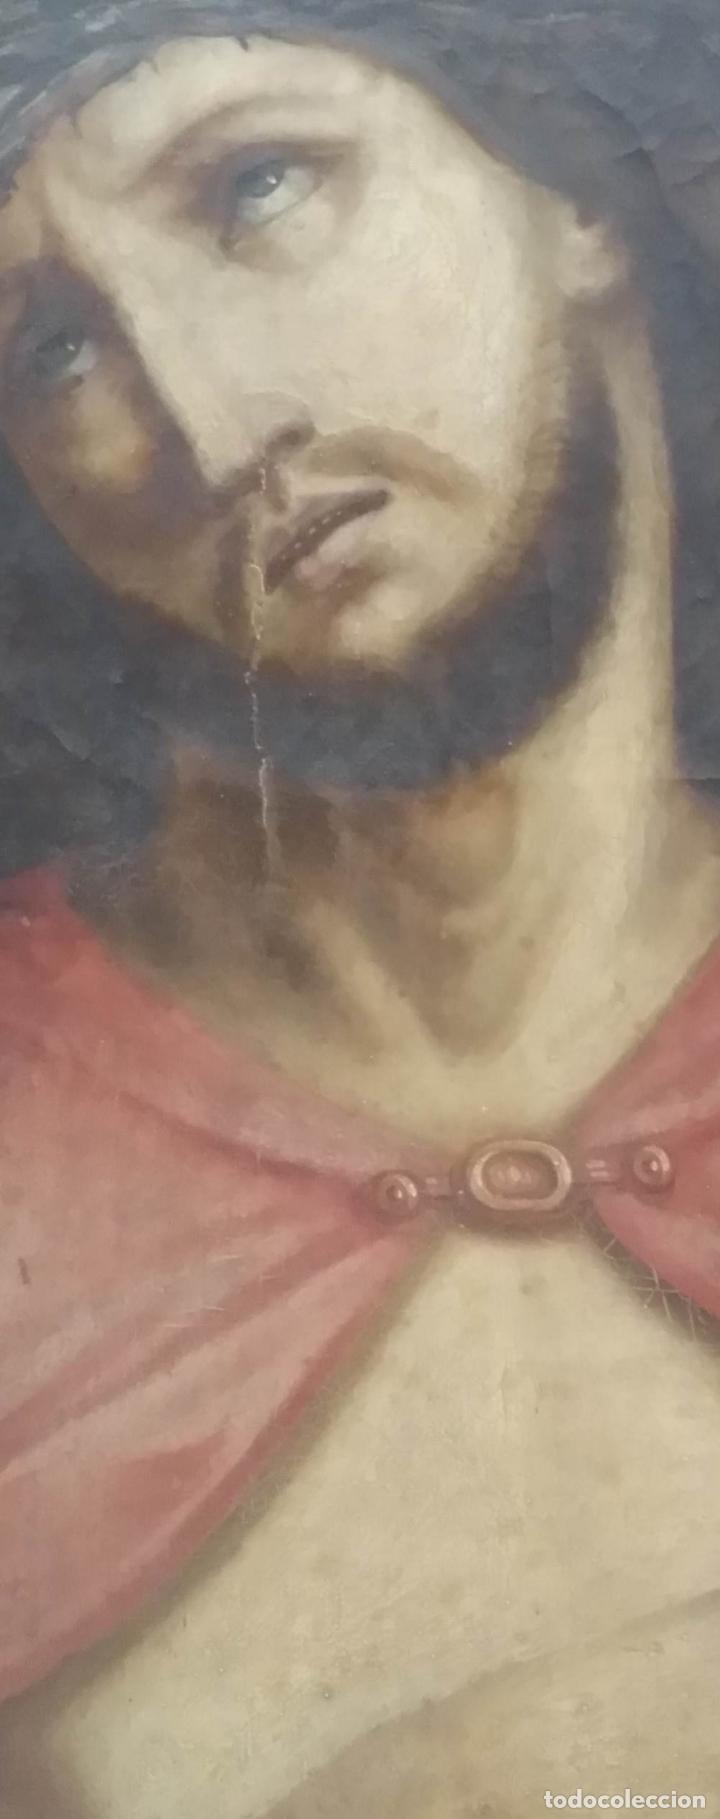 Arte: ECCE HOMO, óleo sobre lienzo. Firmado. Siglo XVII - Foto 11 - 70478885